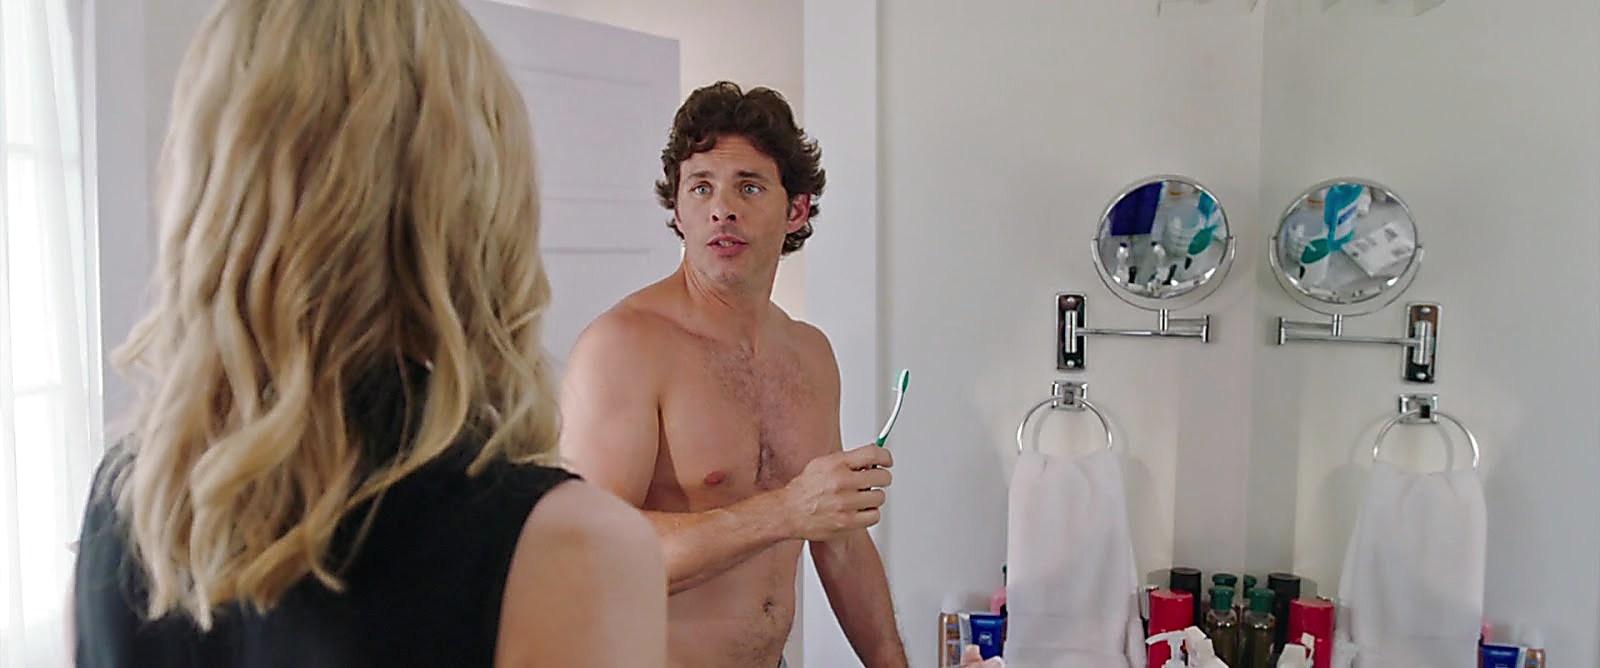 James Marsden sexy shirtless scene February 18, 2018, 11am